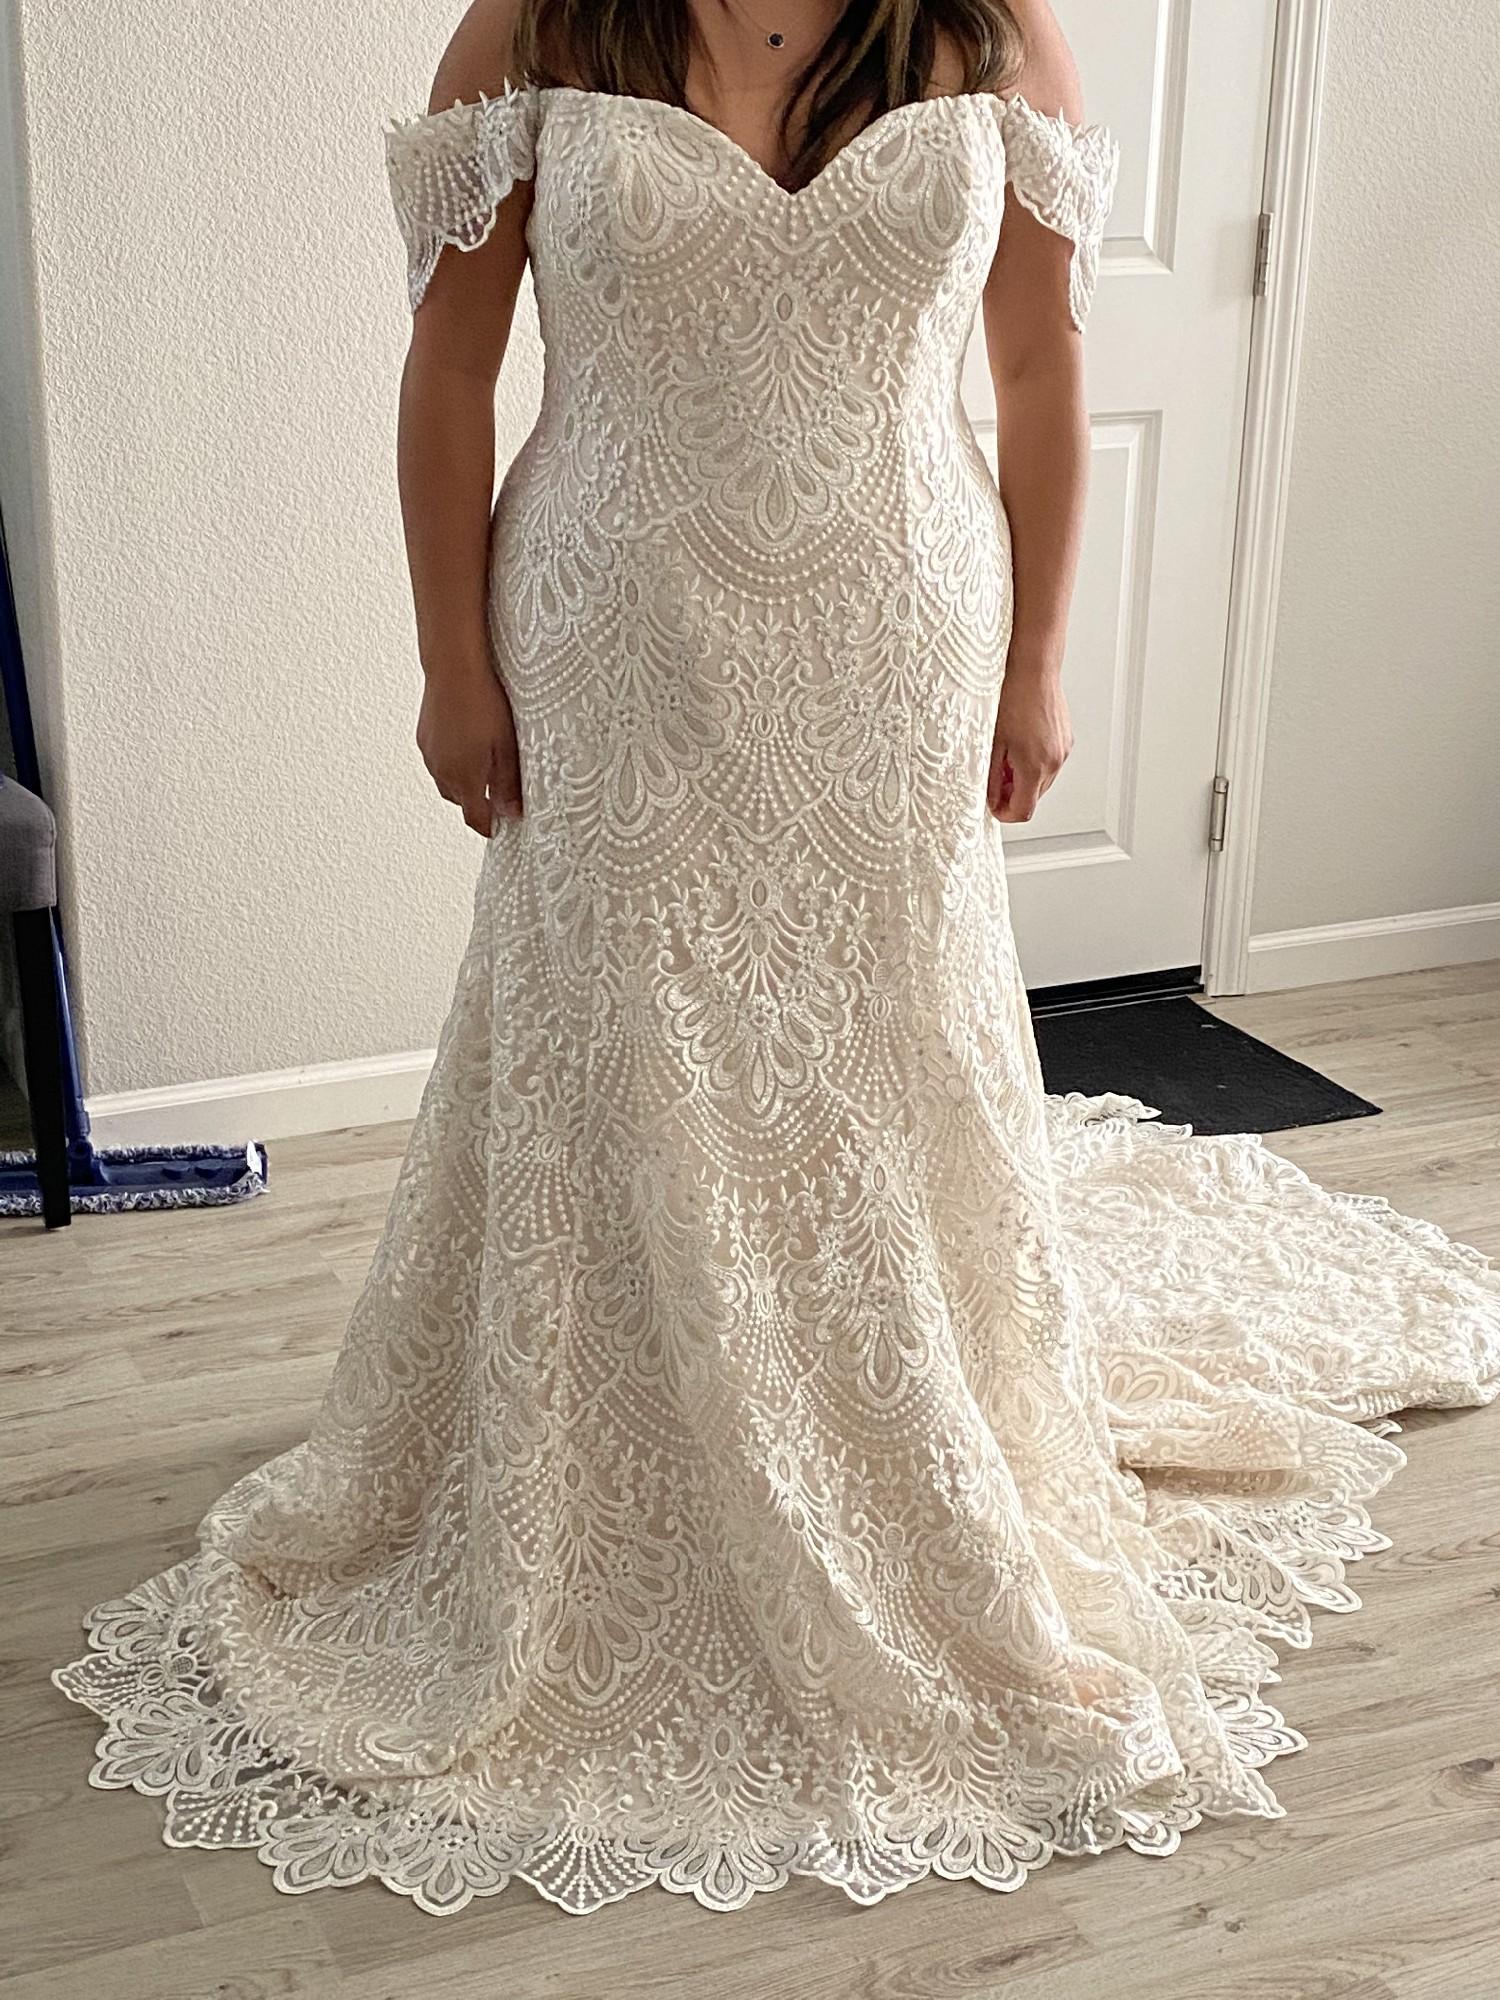 Cxgotxzlaki03m,Vera Wang Wedding Dresses 2019